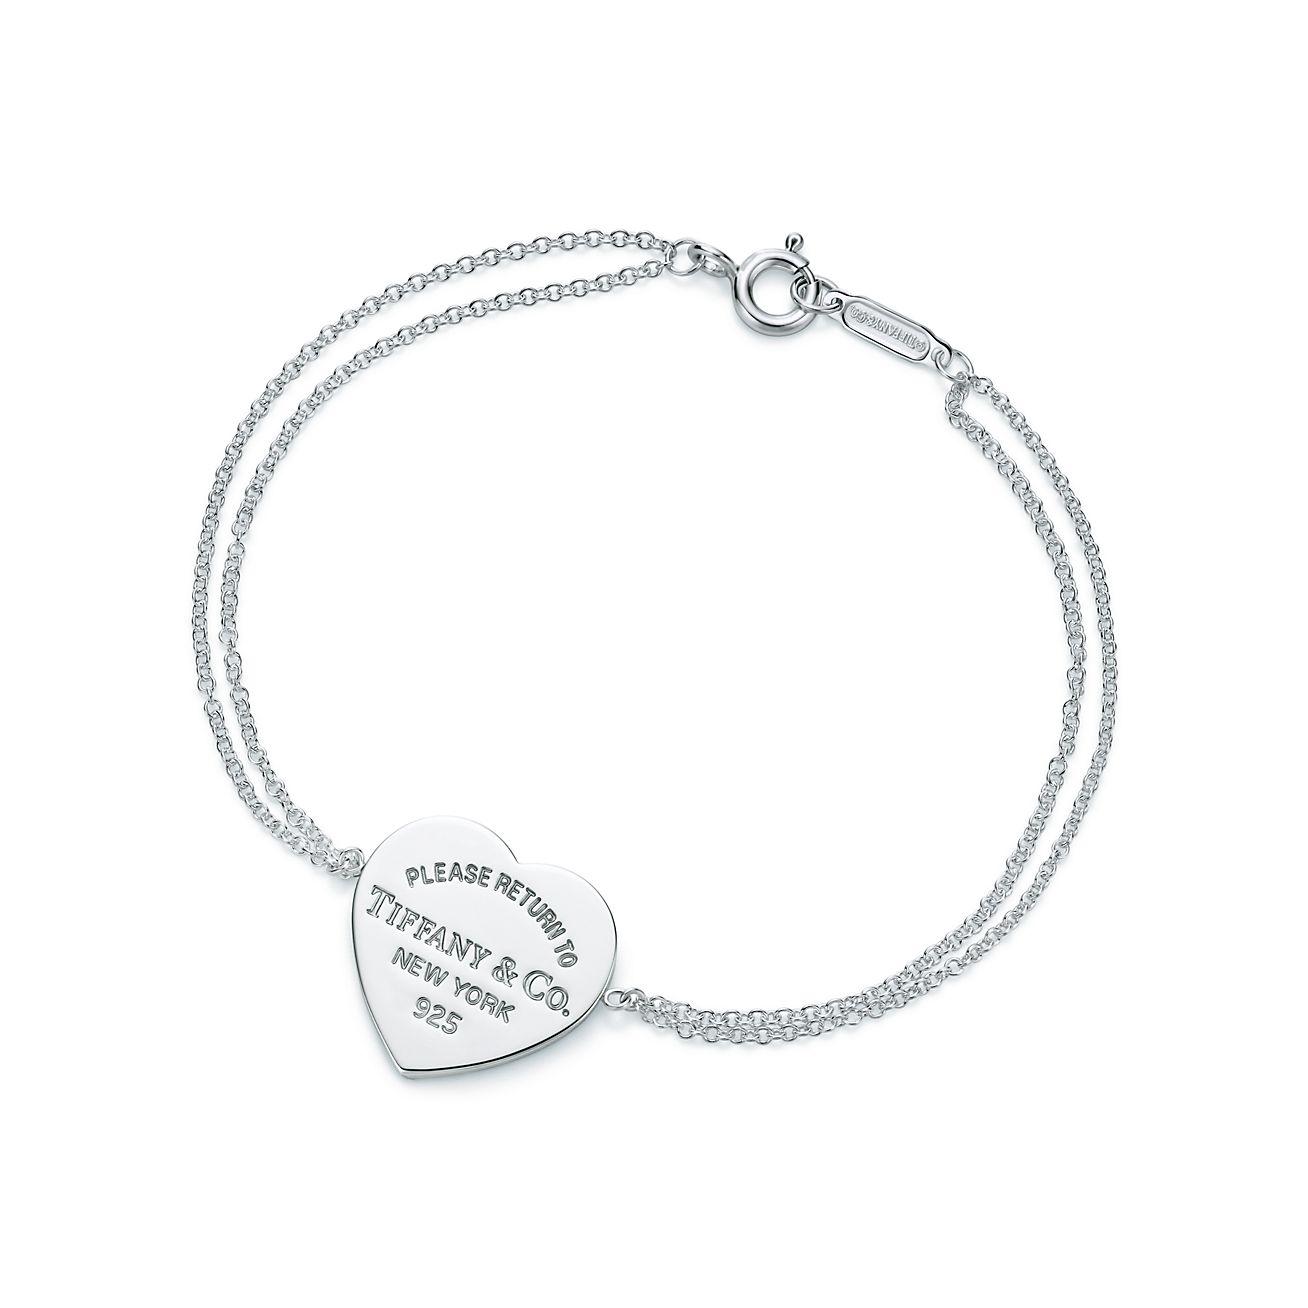 Tiffany Heart Bracelet >> Return To Tiffany Heart Tag Bracelet In Sterling Silver Medium